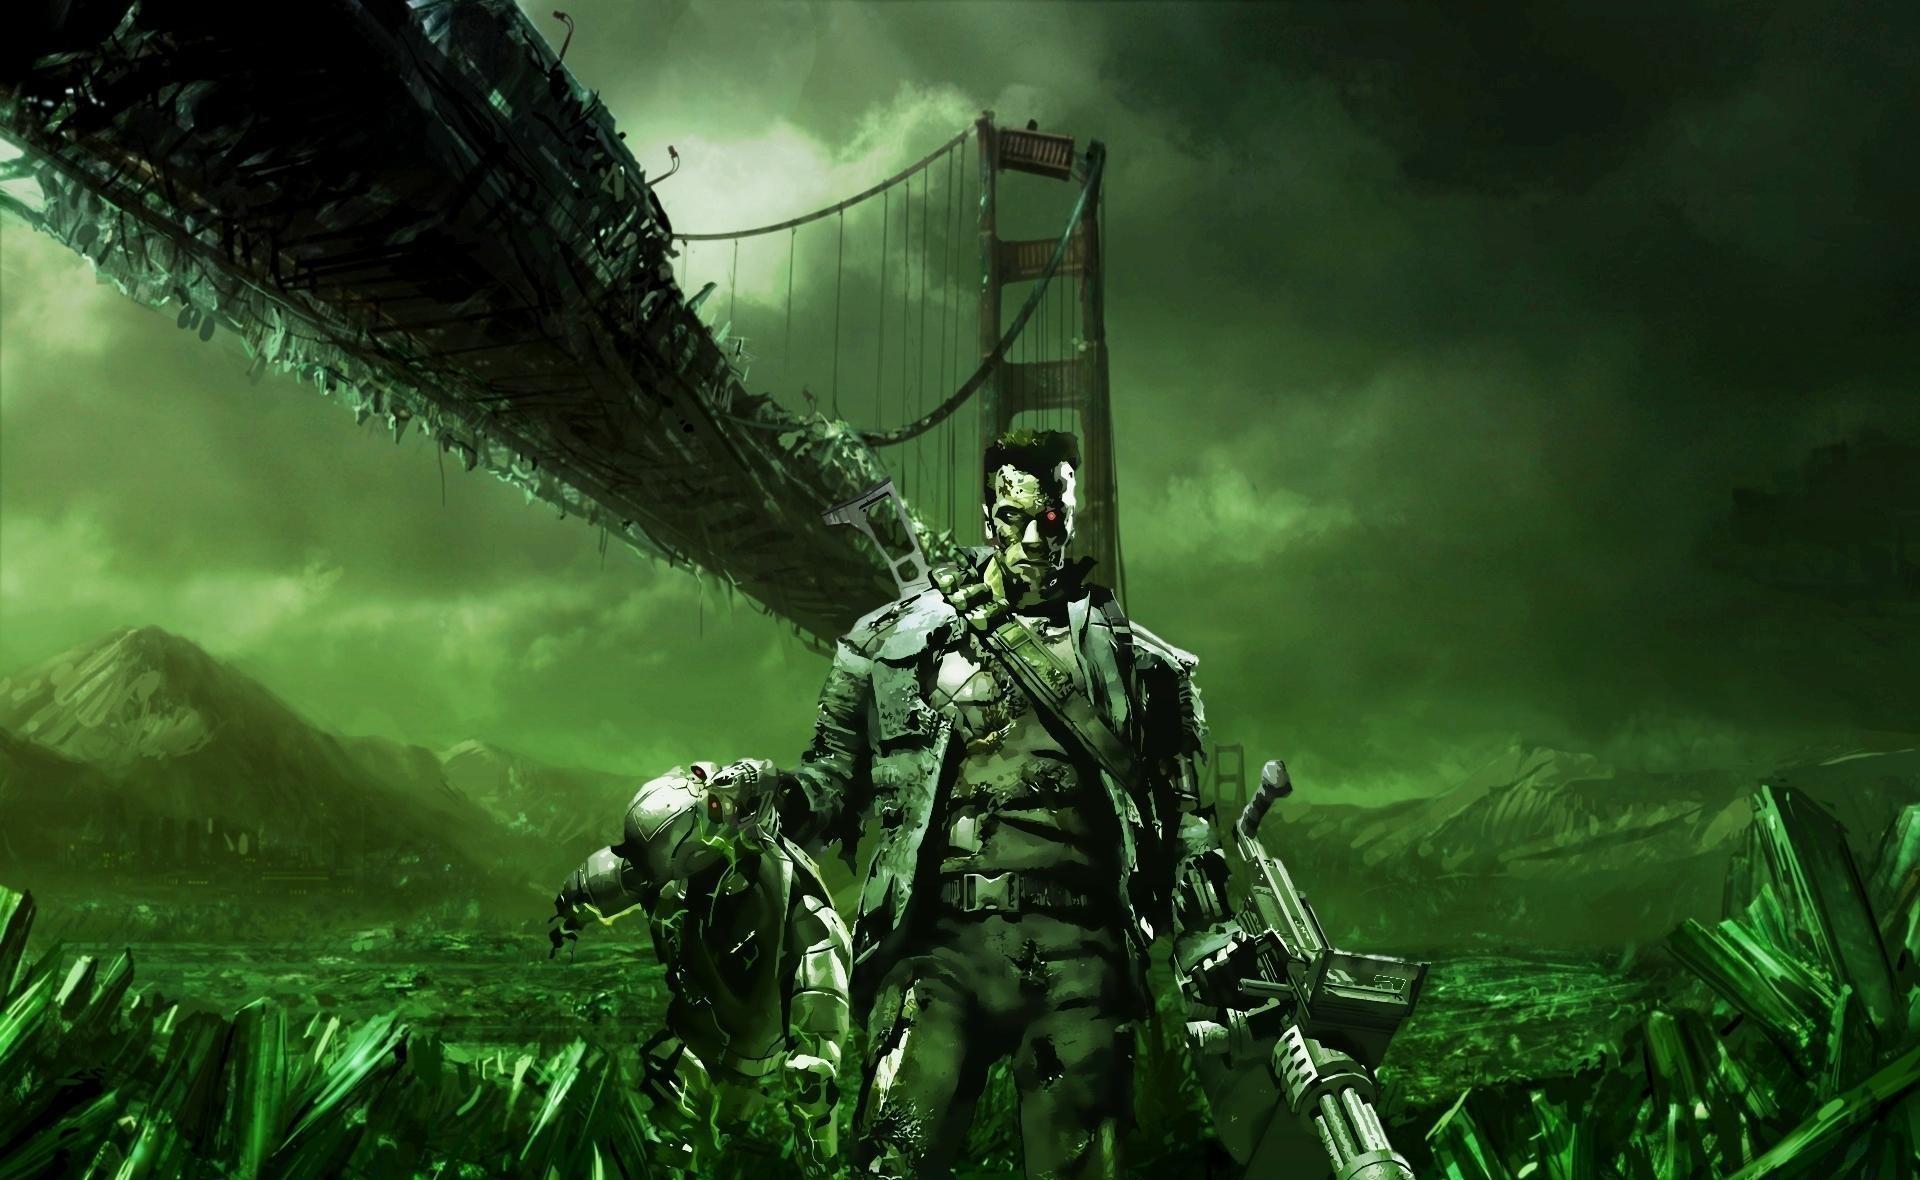 Wallpaper : Terminator, bridge